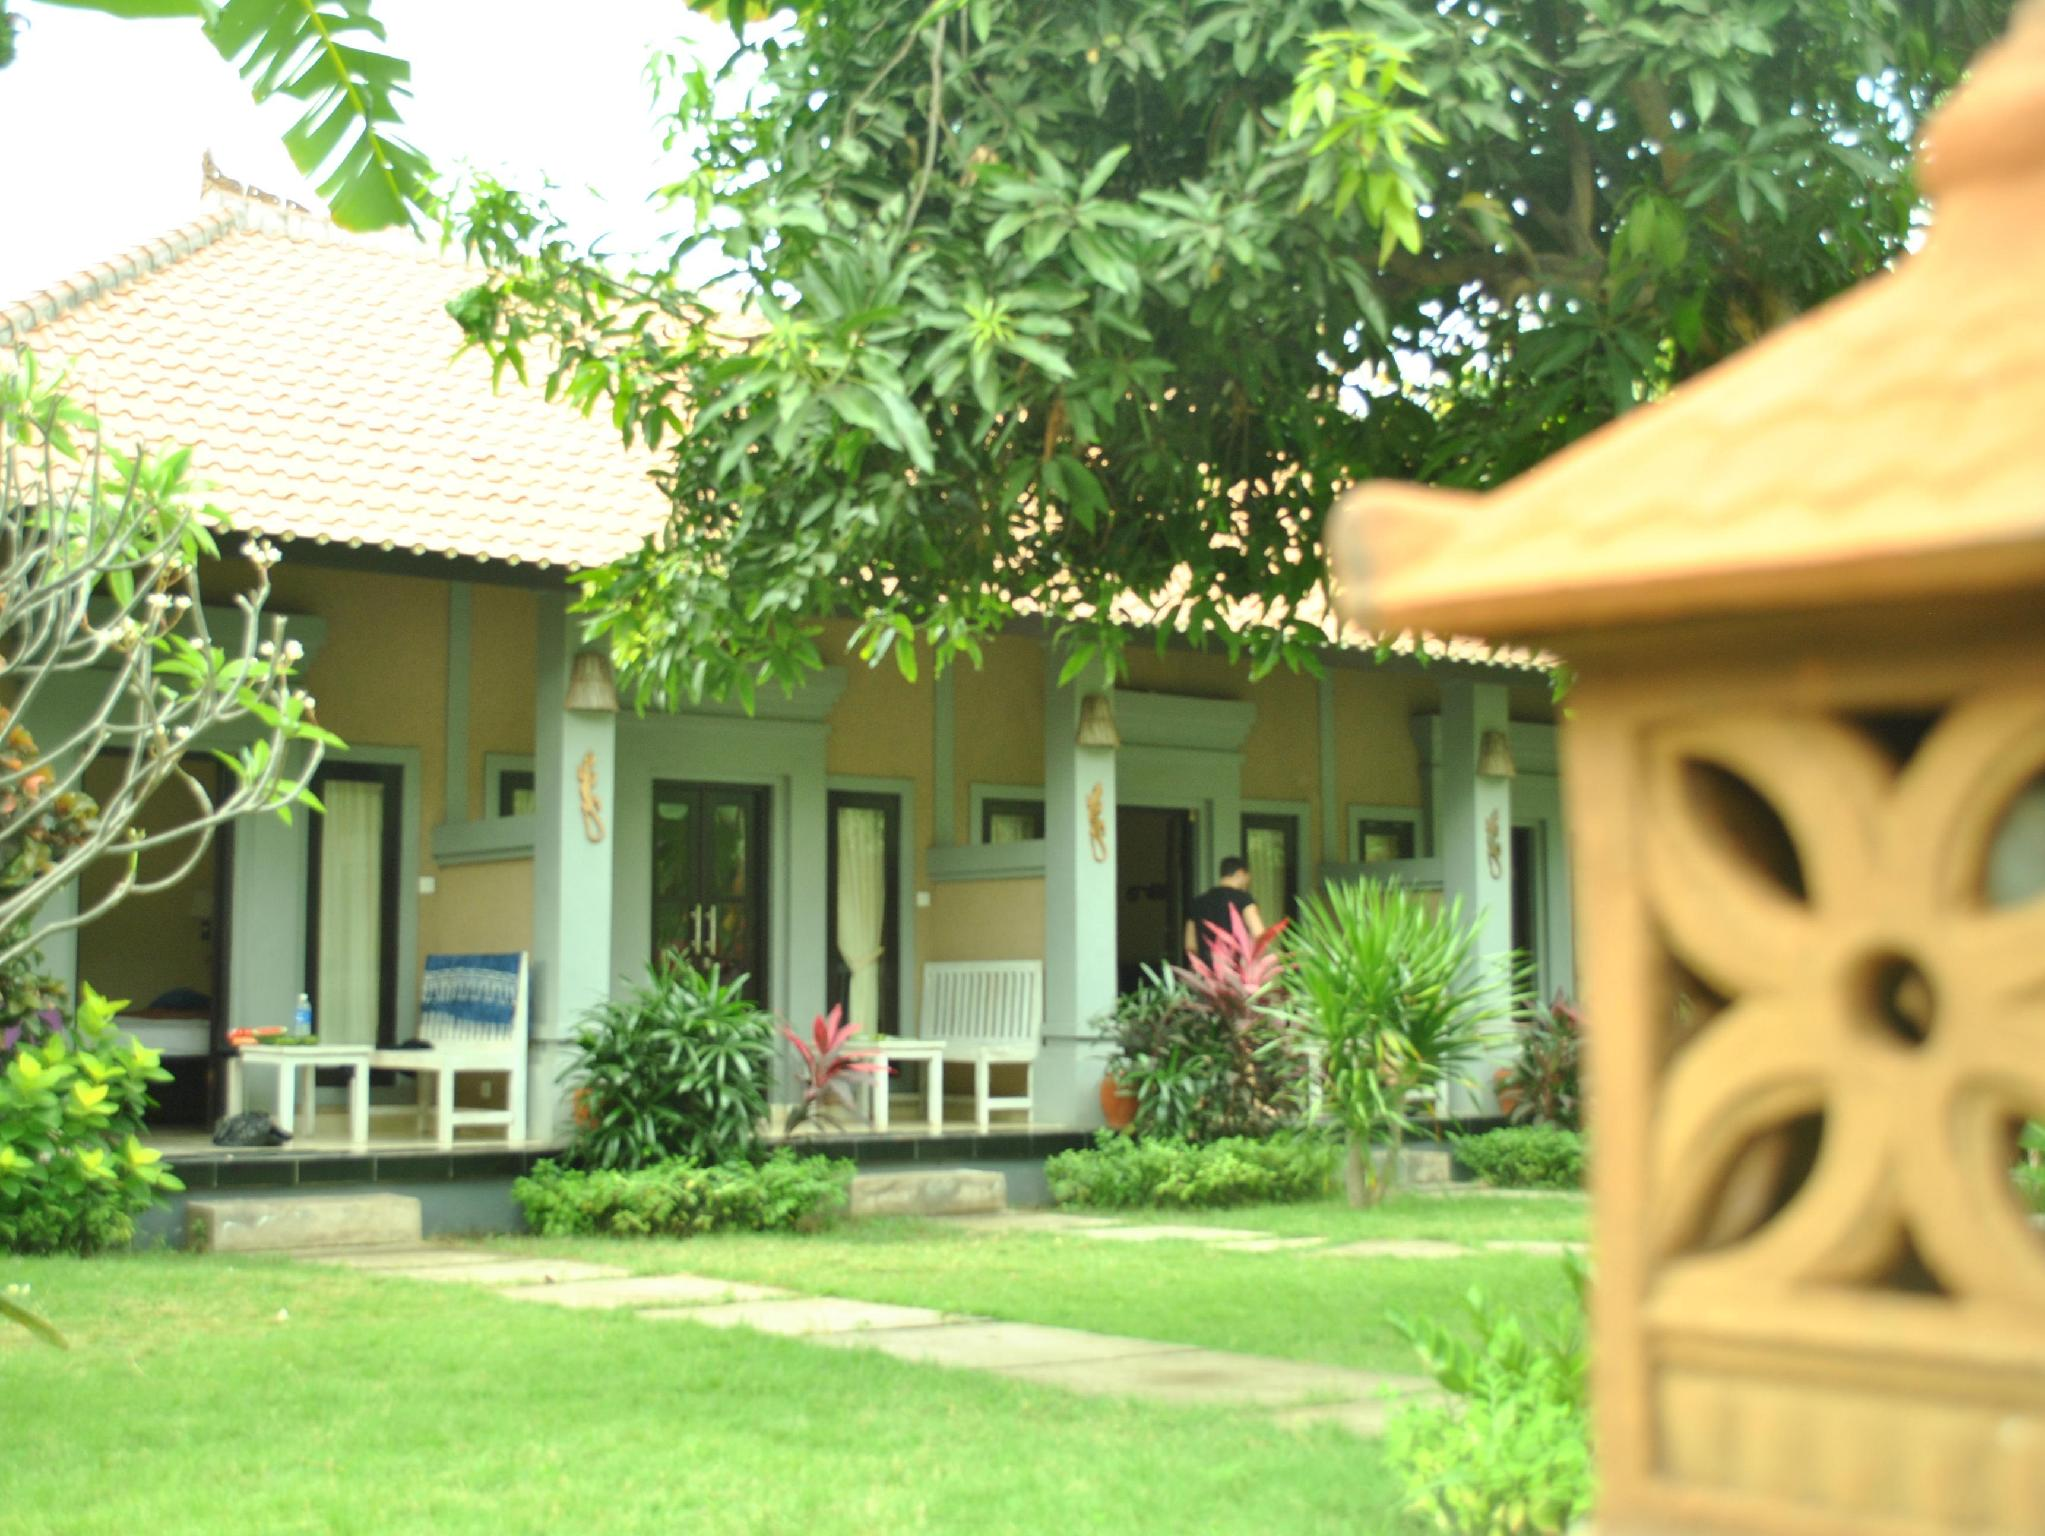 pemuteran map and hotels in pemuteran area bali rh agoda com